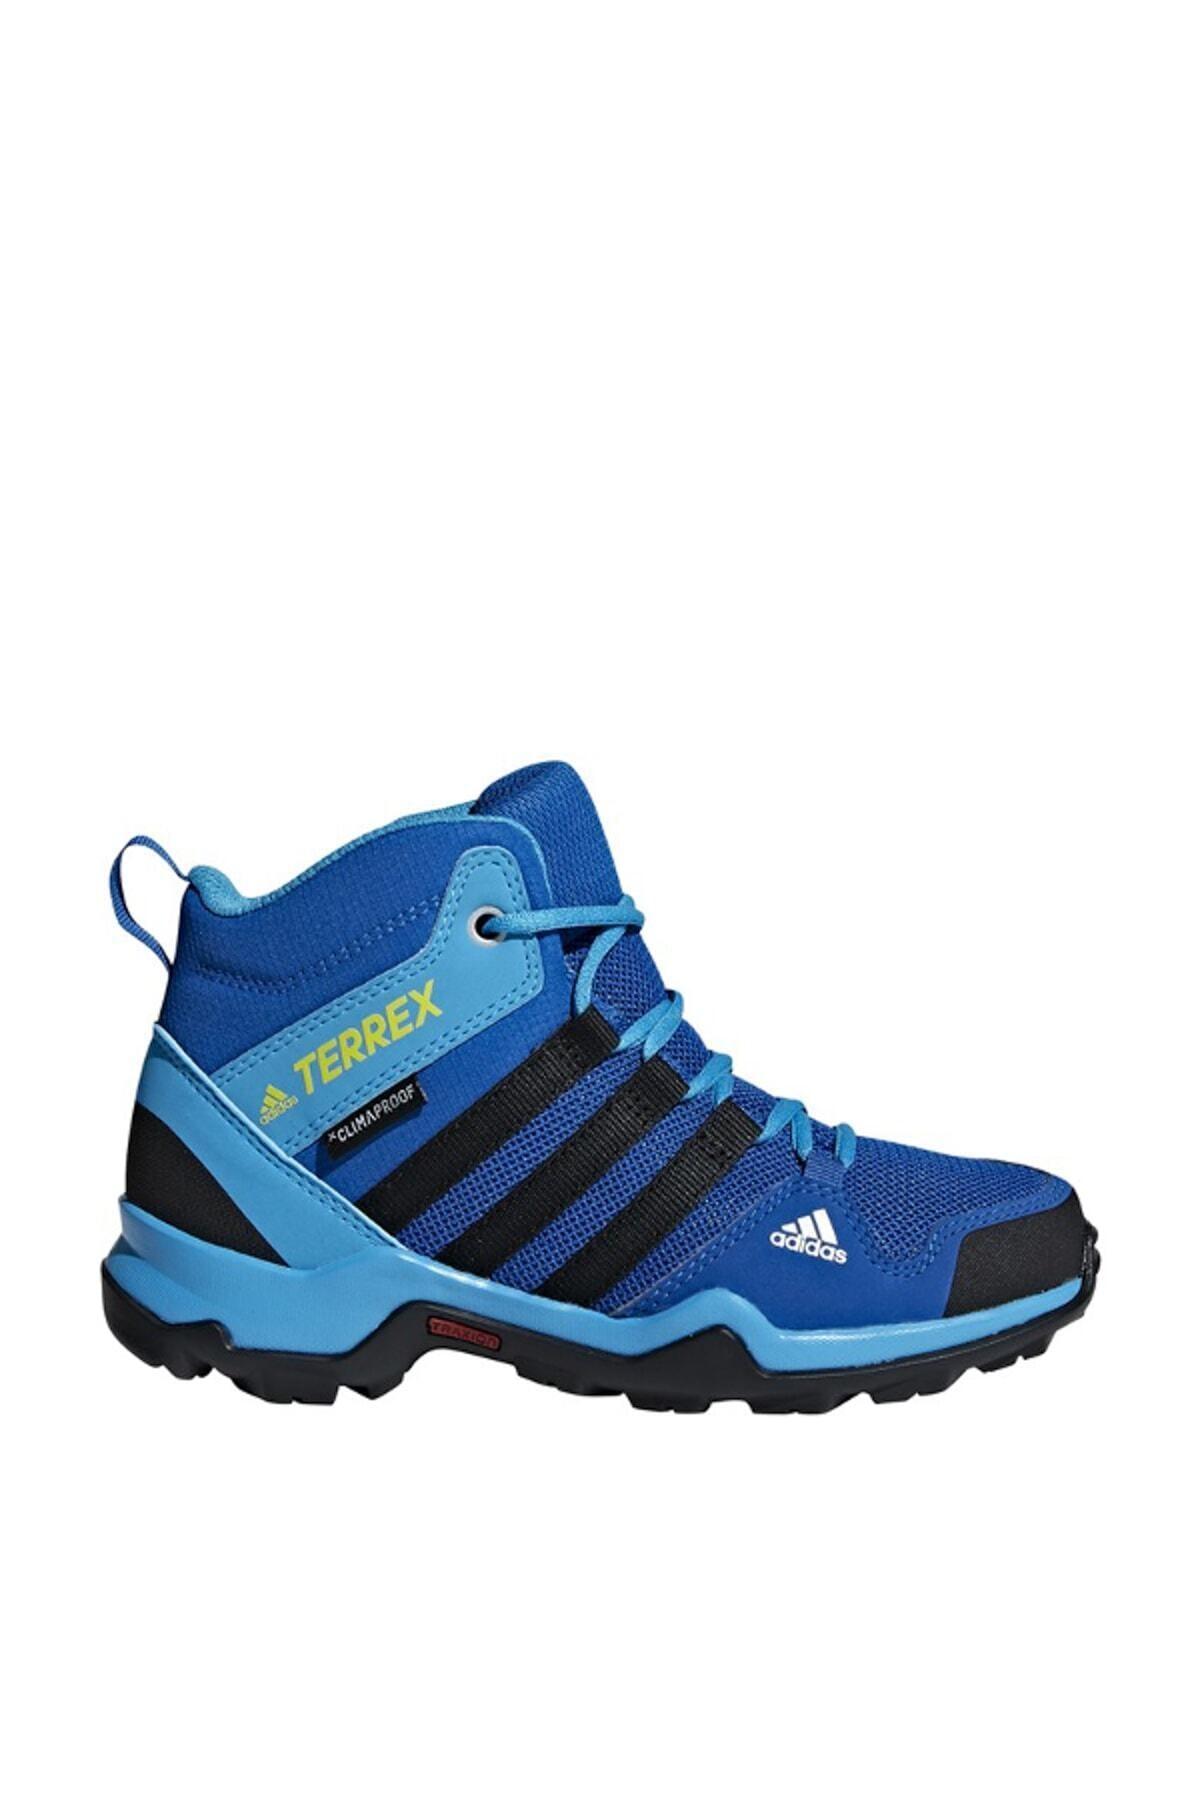 adidas Çocuk Outdoor Ayakkabı Terrex Ax2r Mid Cp K 1